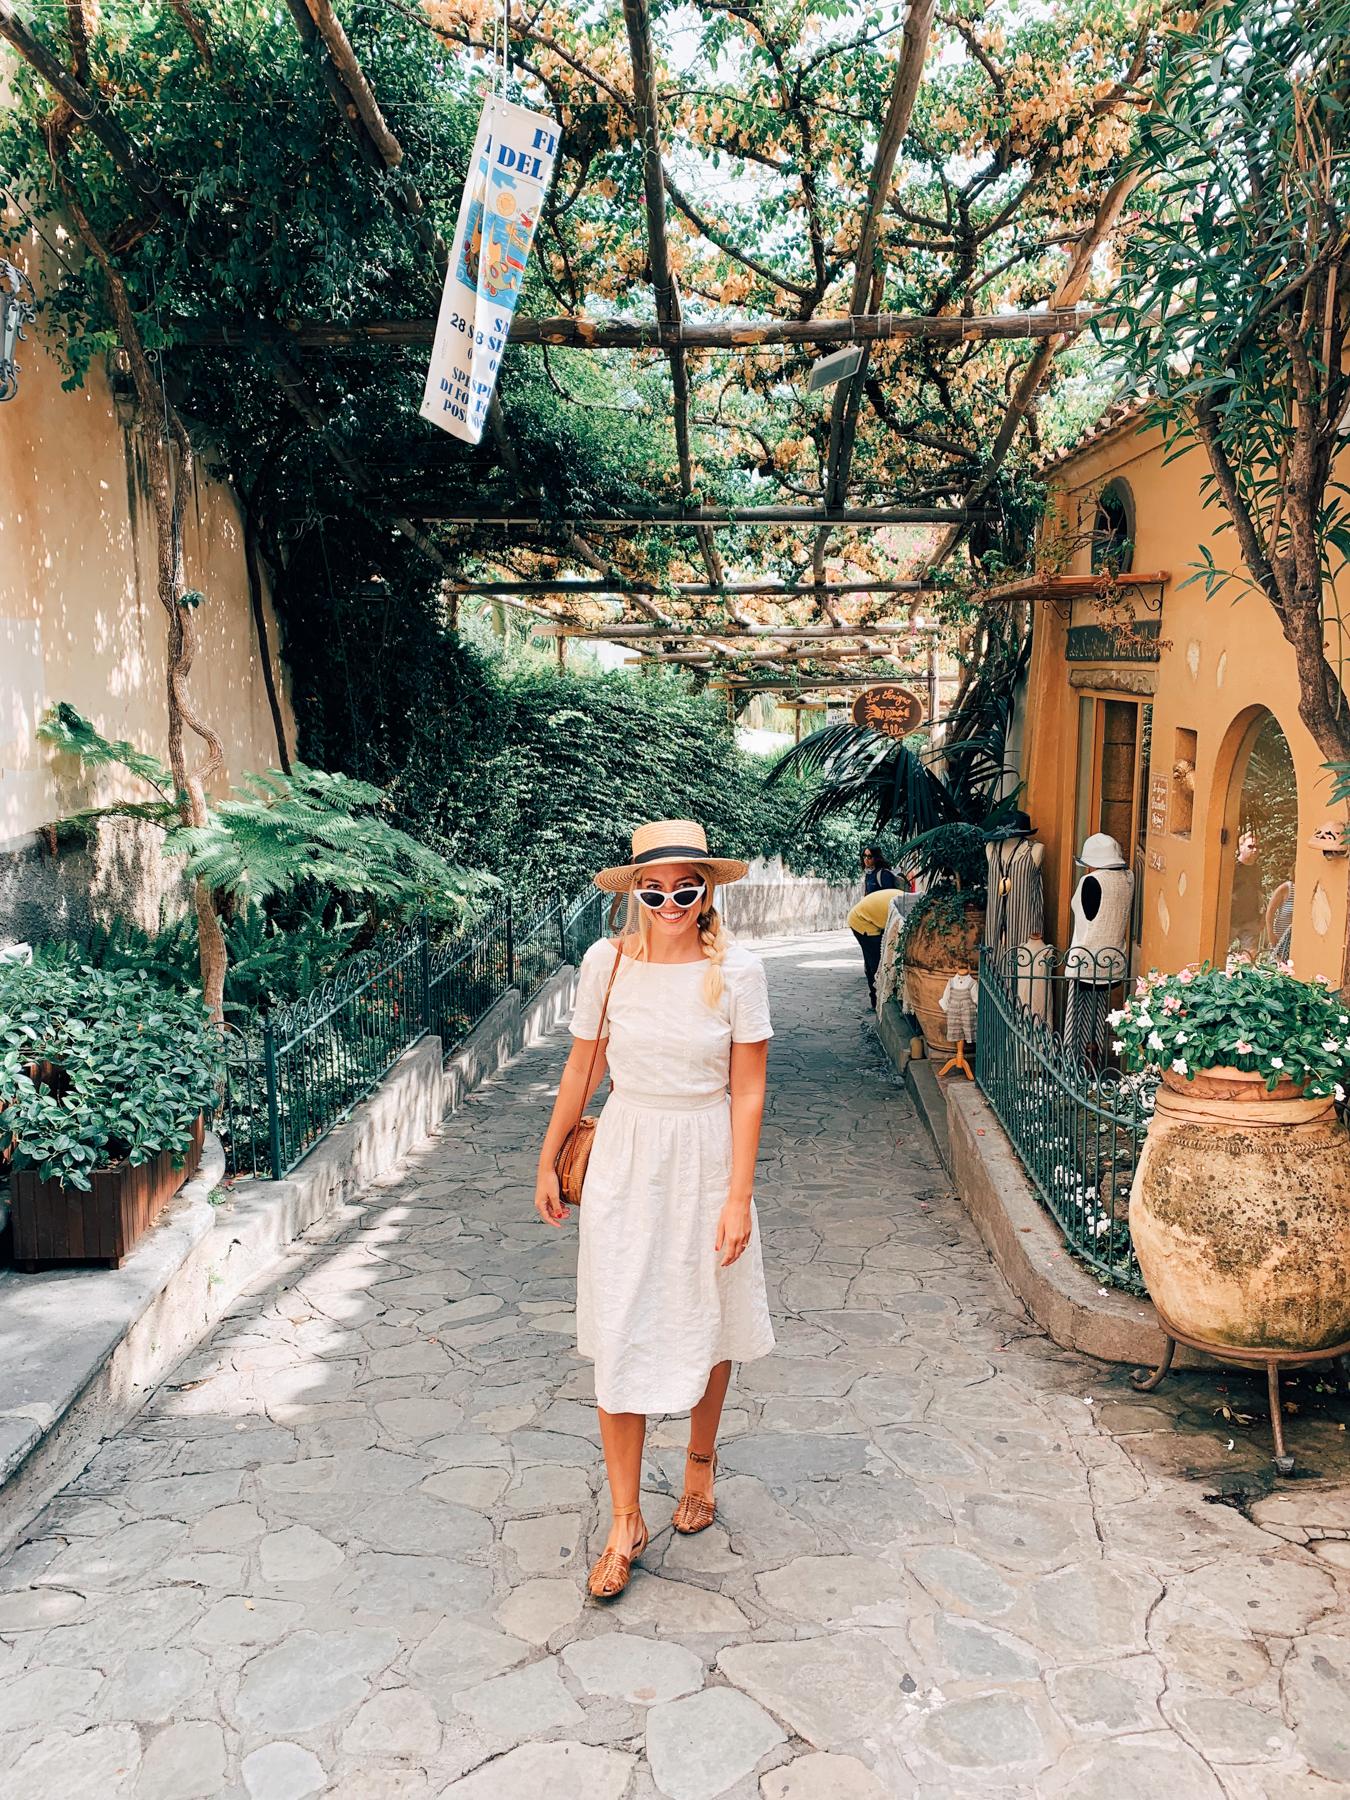 Walking around the charming village